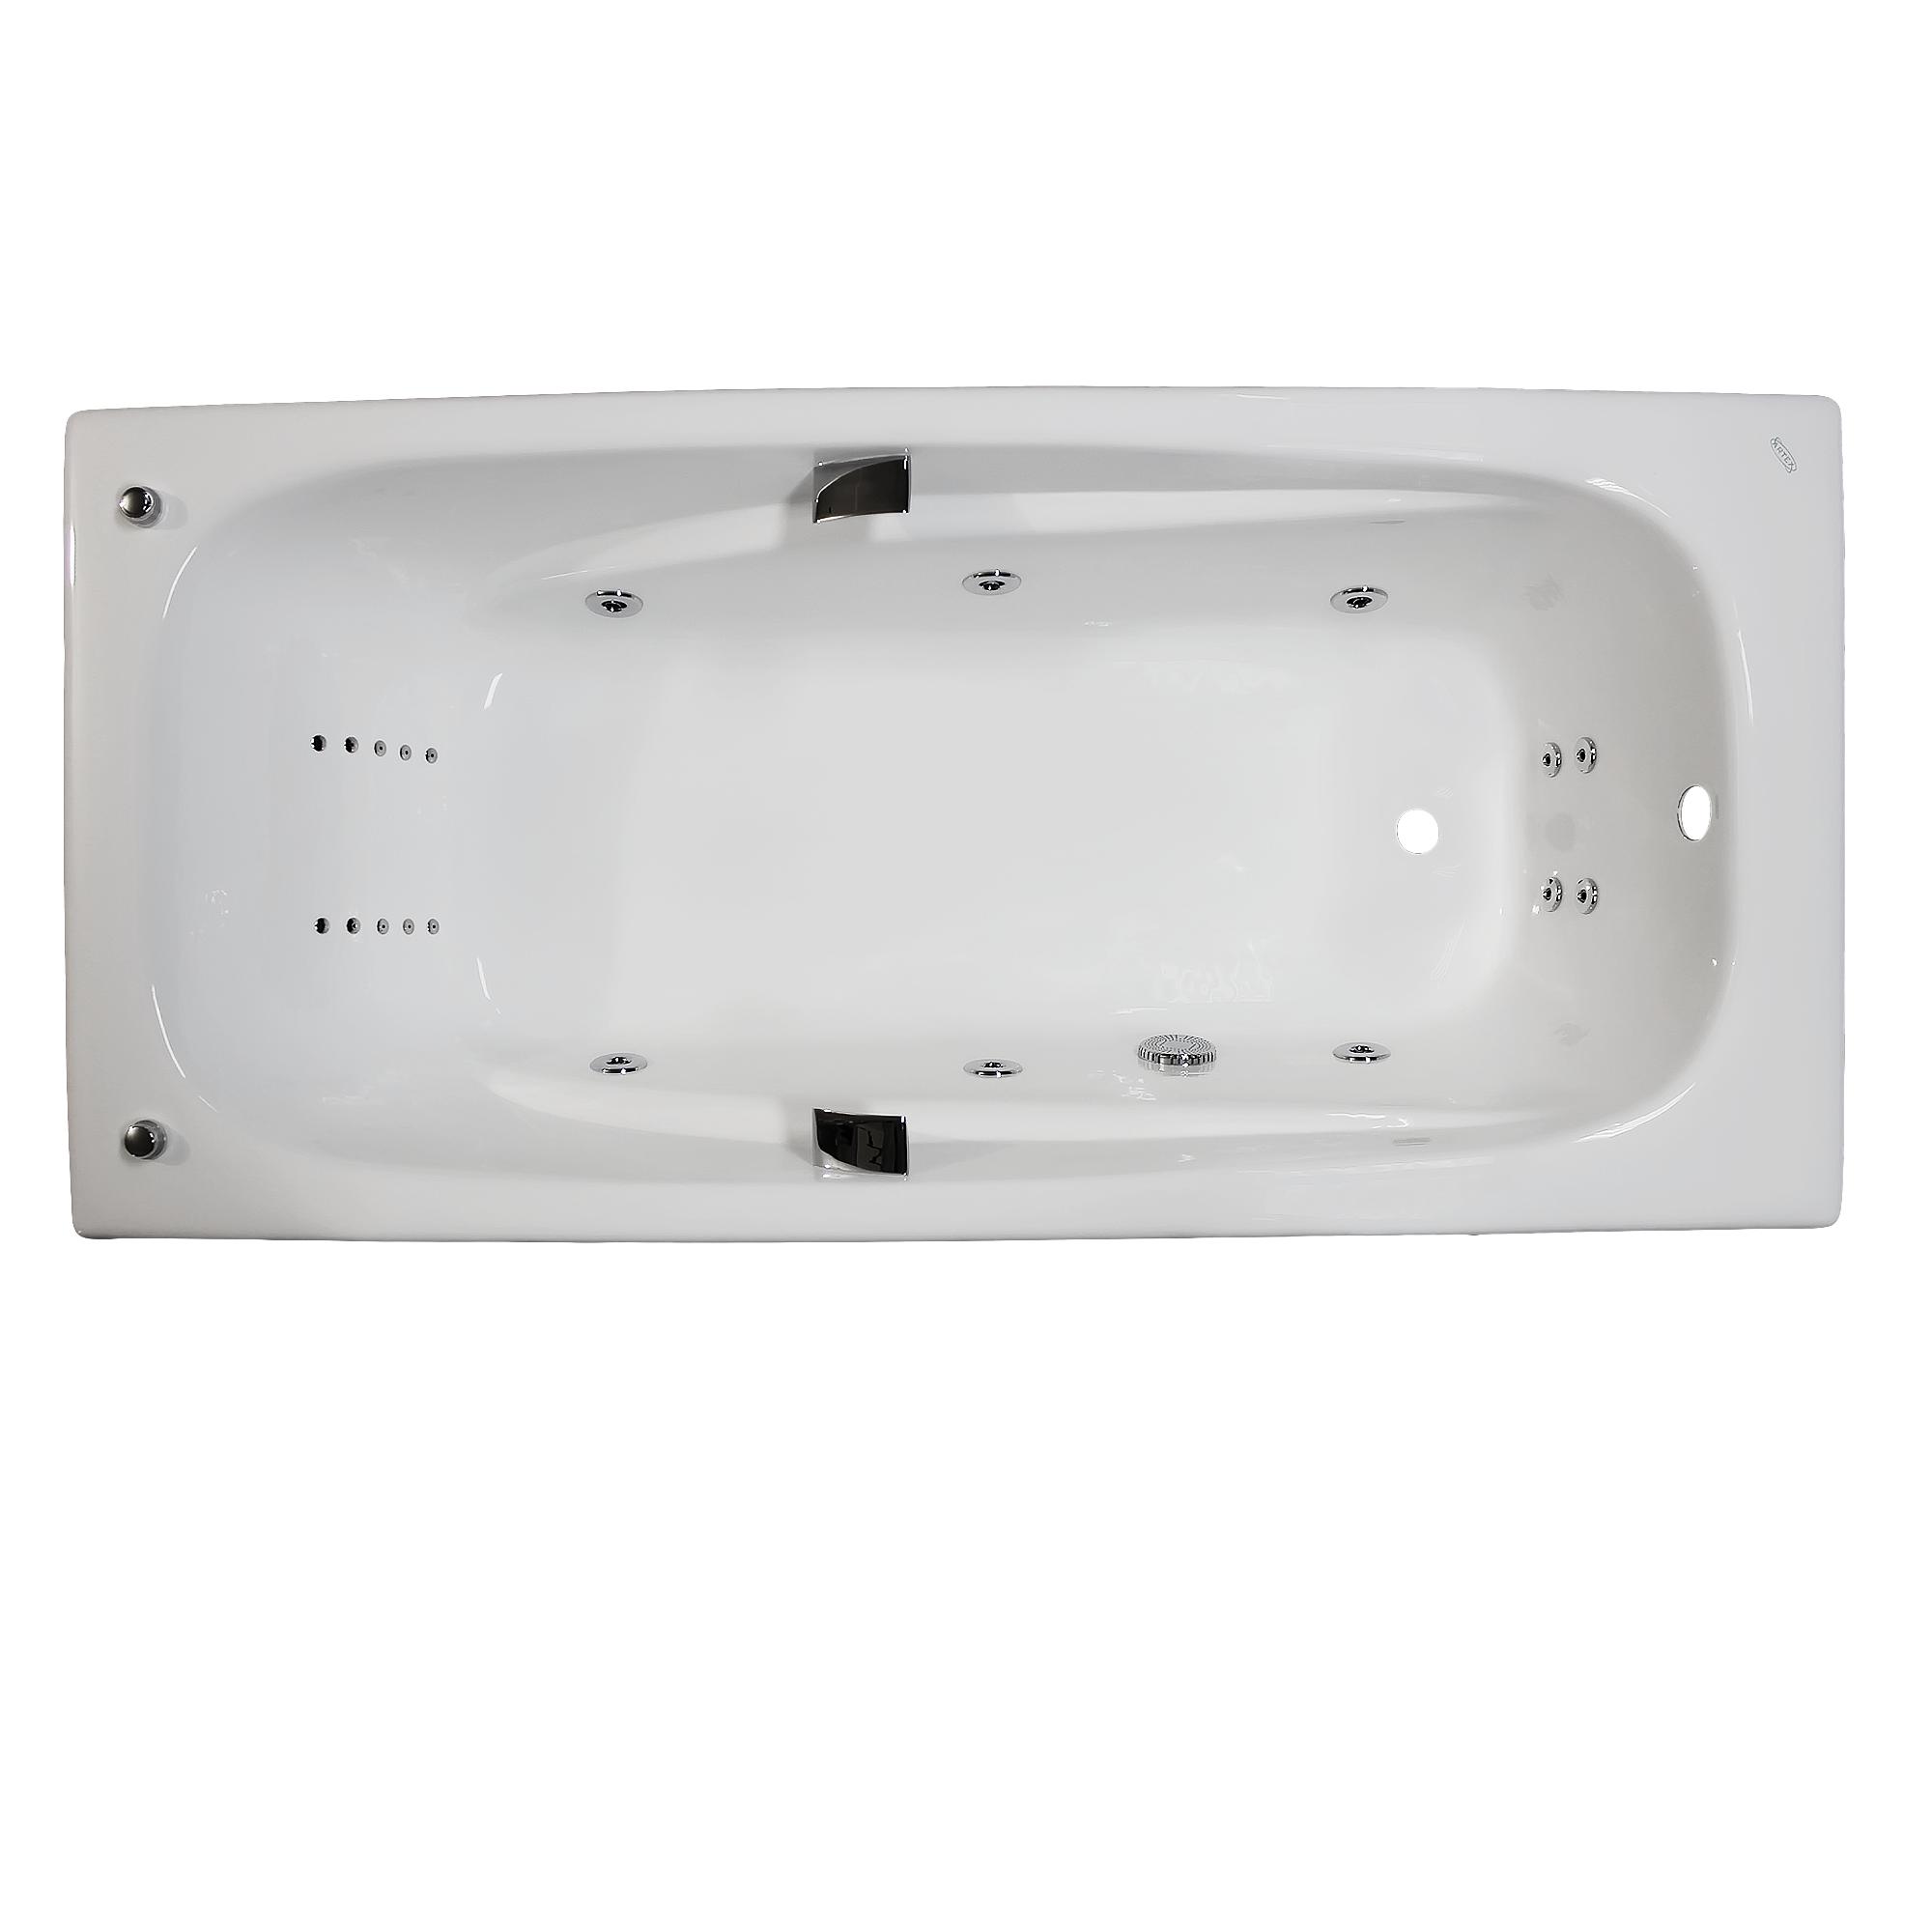 Ванна Artex Repo 180x85